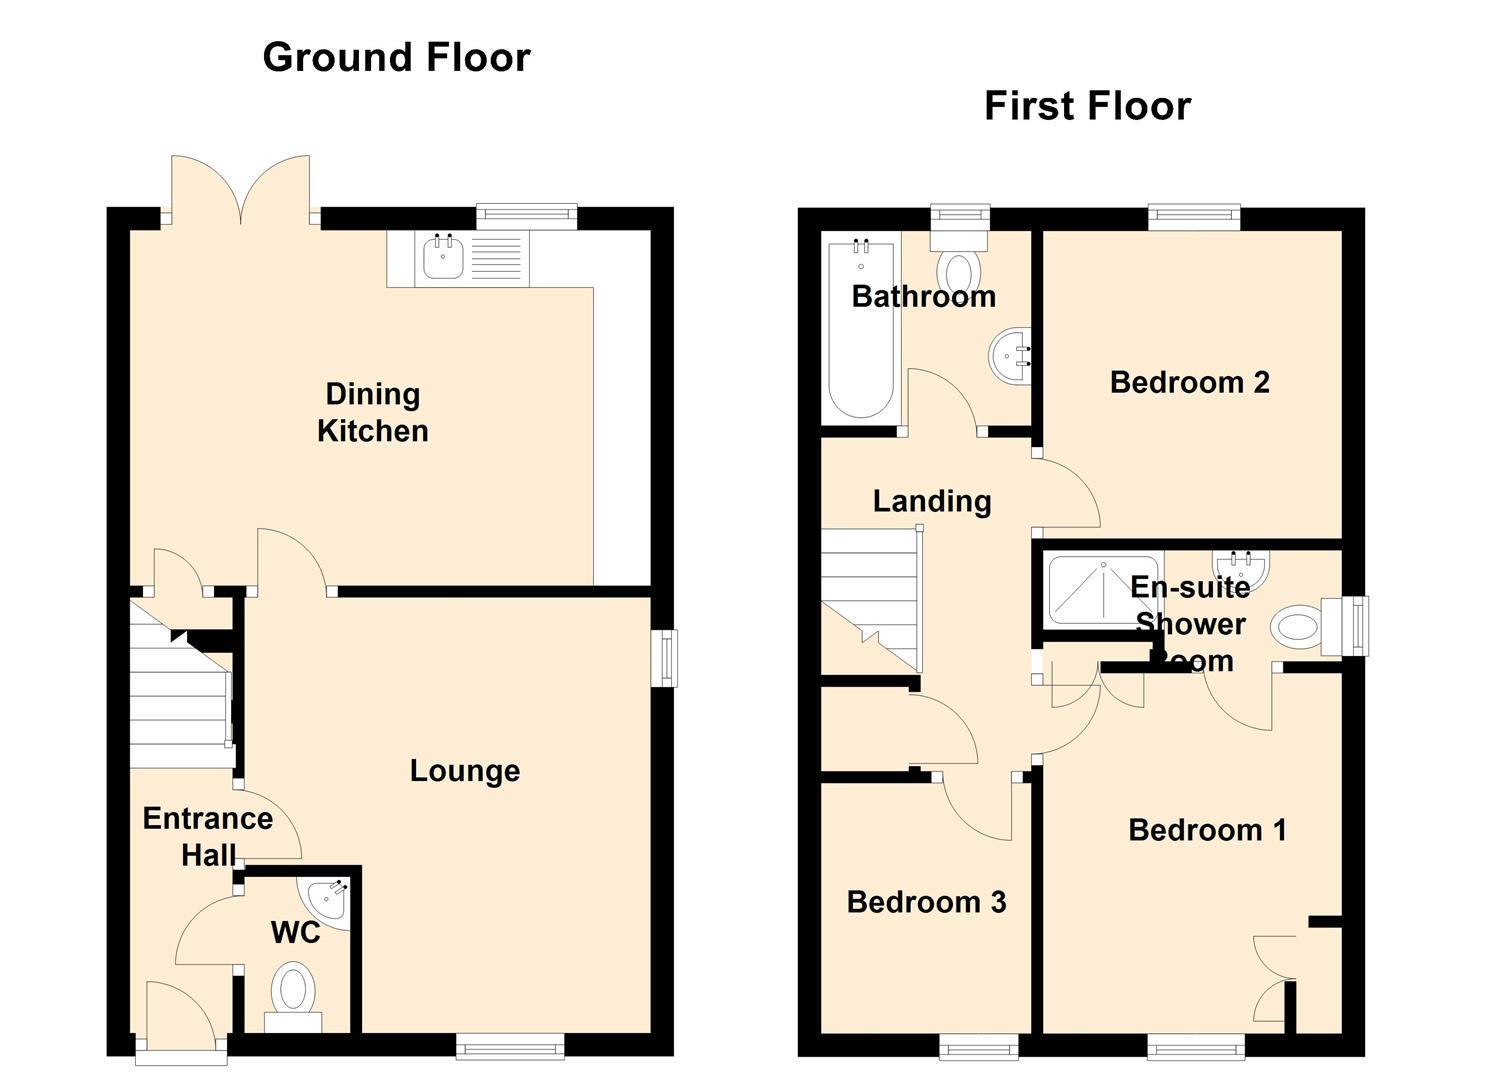 Holland crescent ashby de la zouch le65 3 bedroom semi for 1077 marinaside crescent floor plan